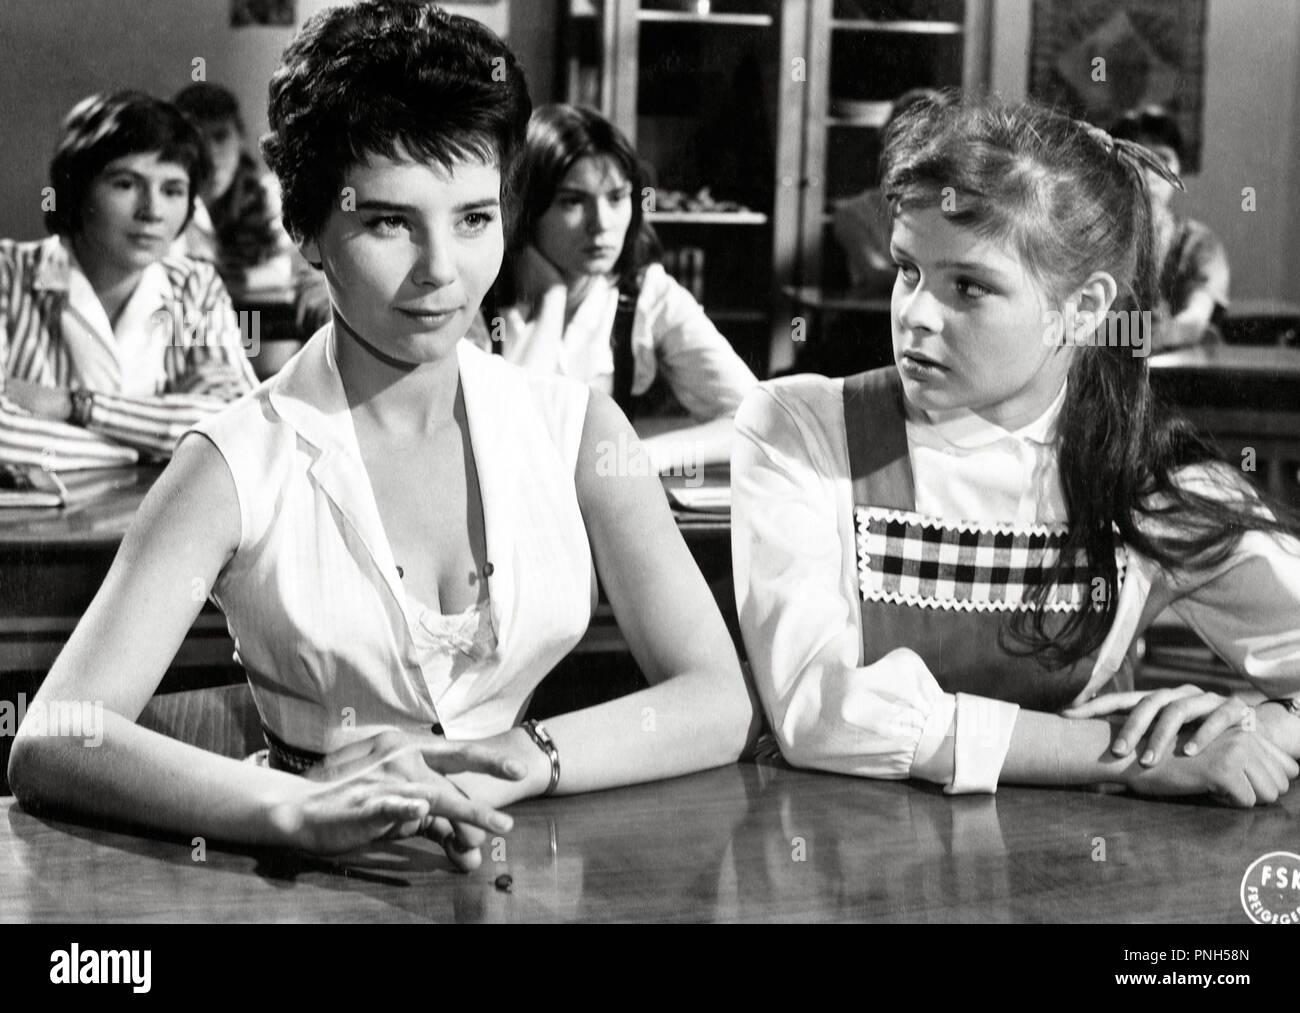 Original film title: SCHMUTZIGER ENGEL. English title: IMPERFECT ANGEL. Year: 1958. Director: ALFRED VOHRER. Stars: CORNY COLLINS. Credit: ULTRA FILM / Album - Stock Image